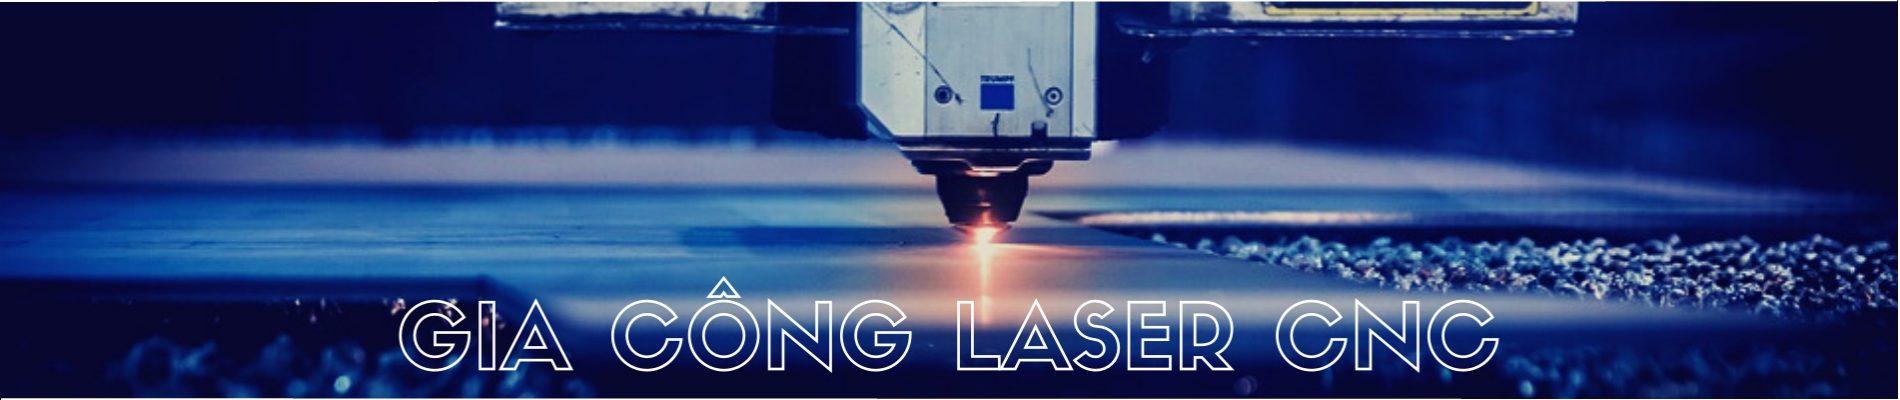 Banner gia công laser kim loại